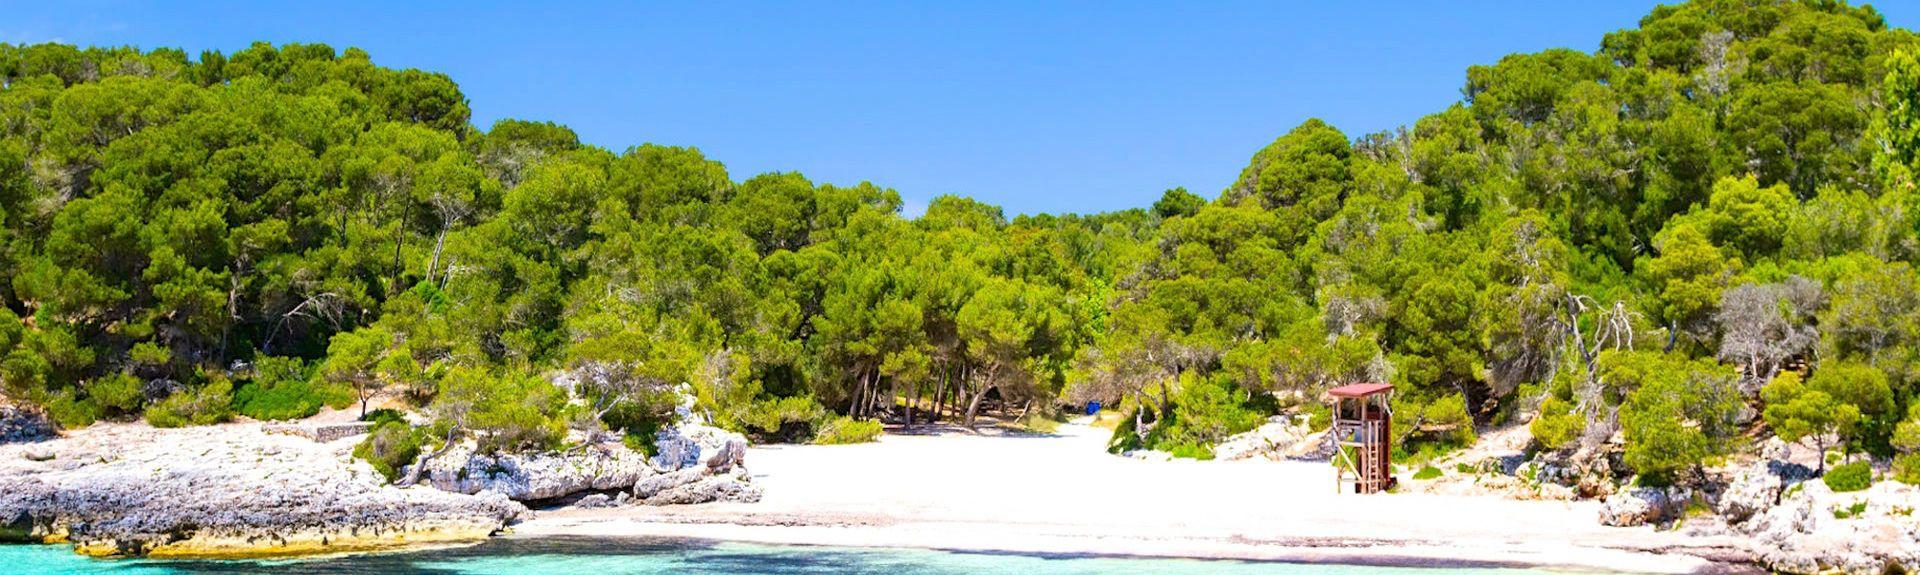 Santandria, Ciutadella de Menorca, Baléares, Espagne